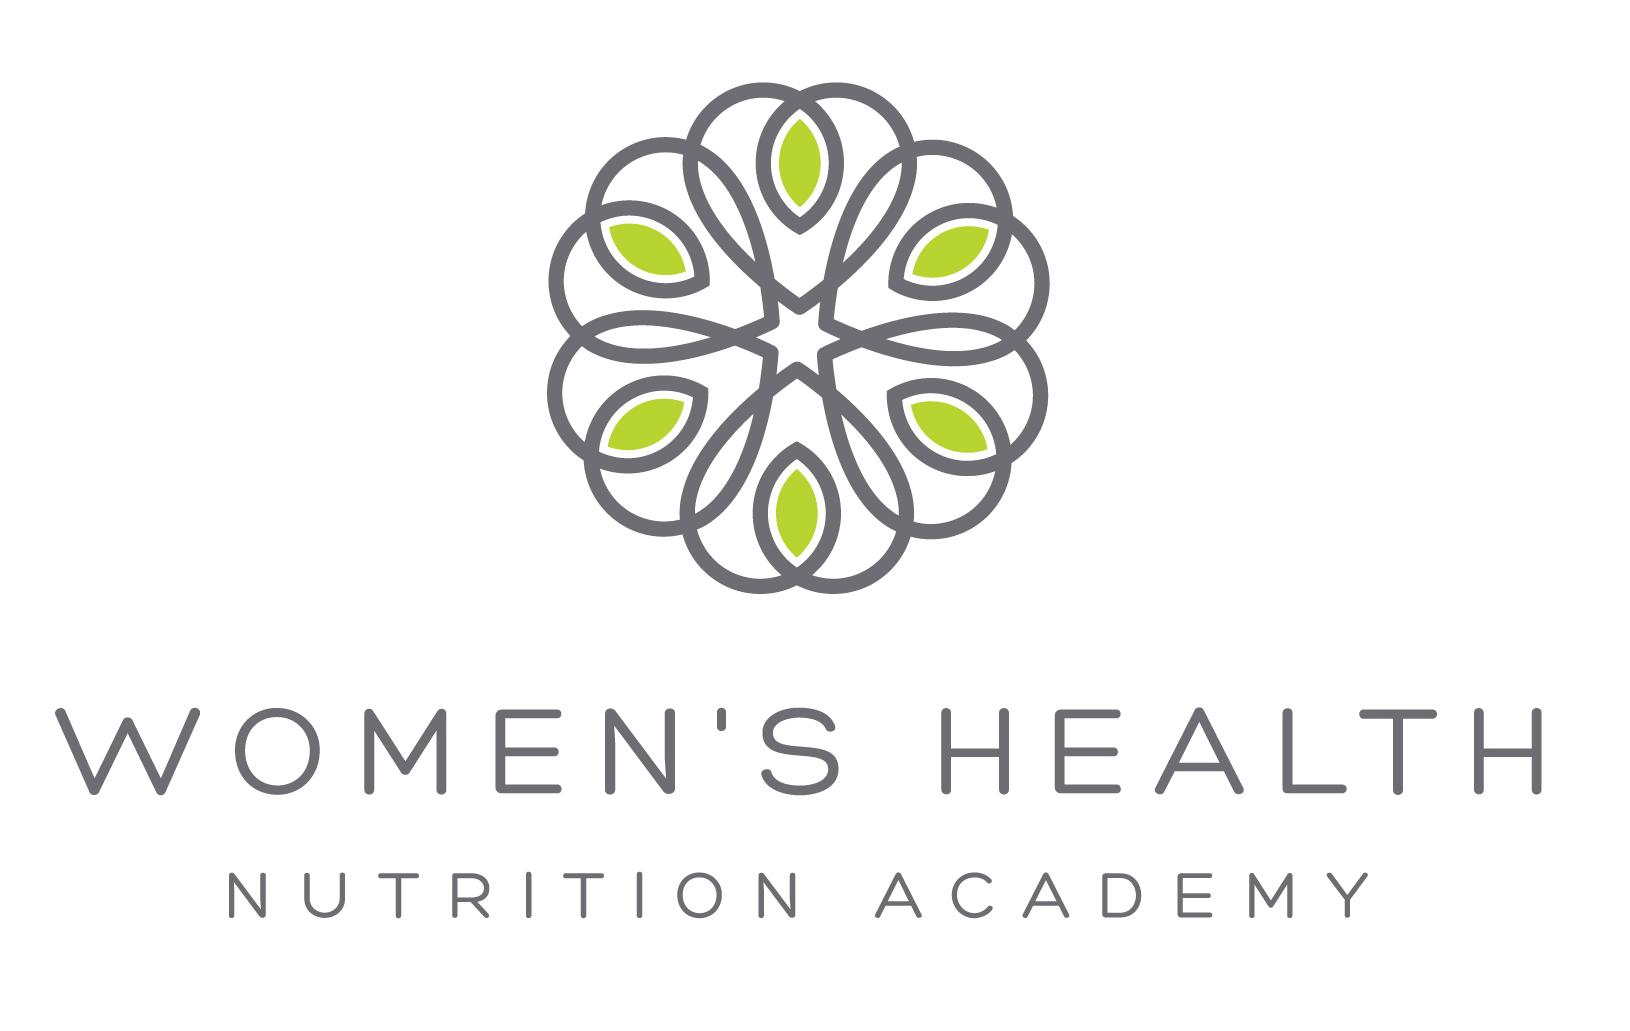 Women's Health Nutrition Academy